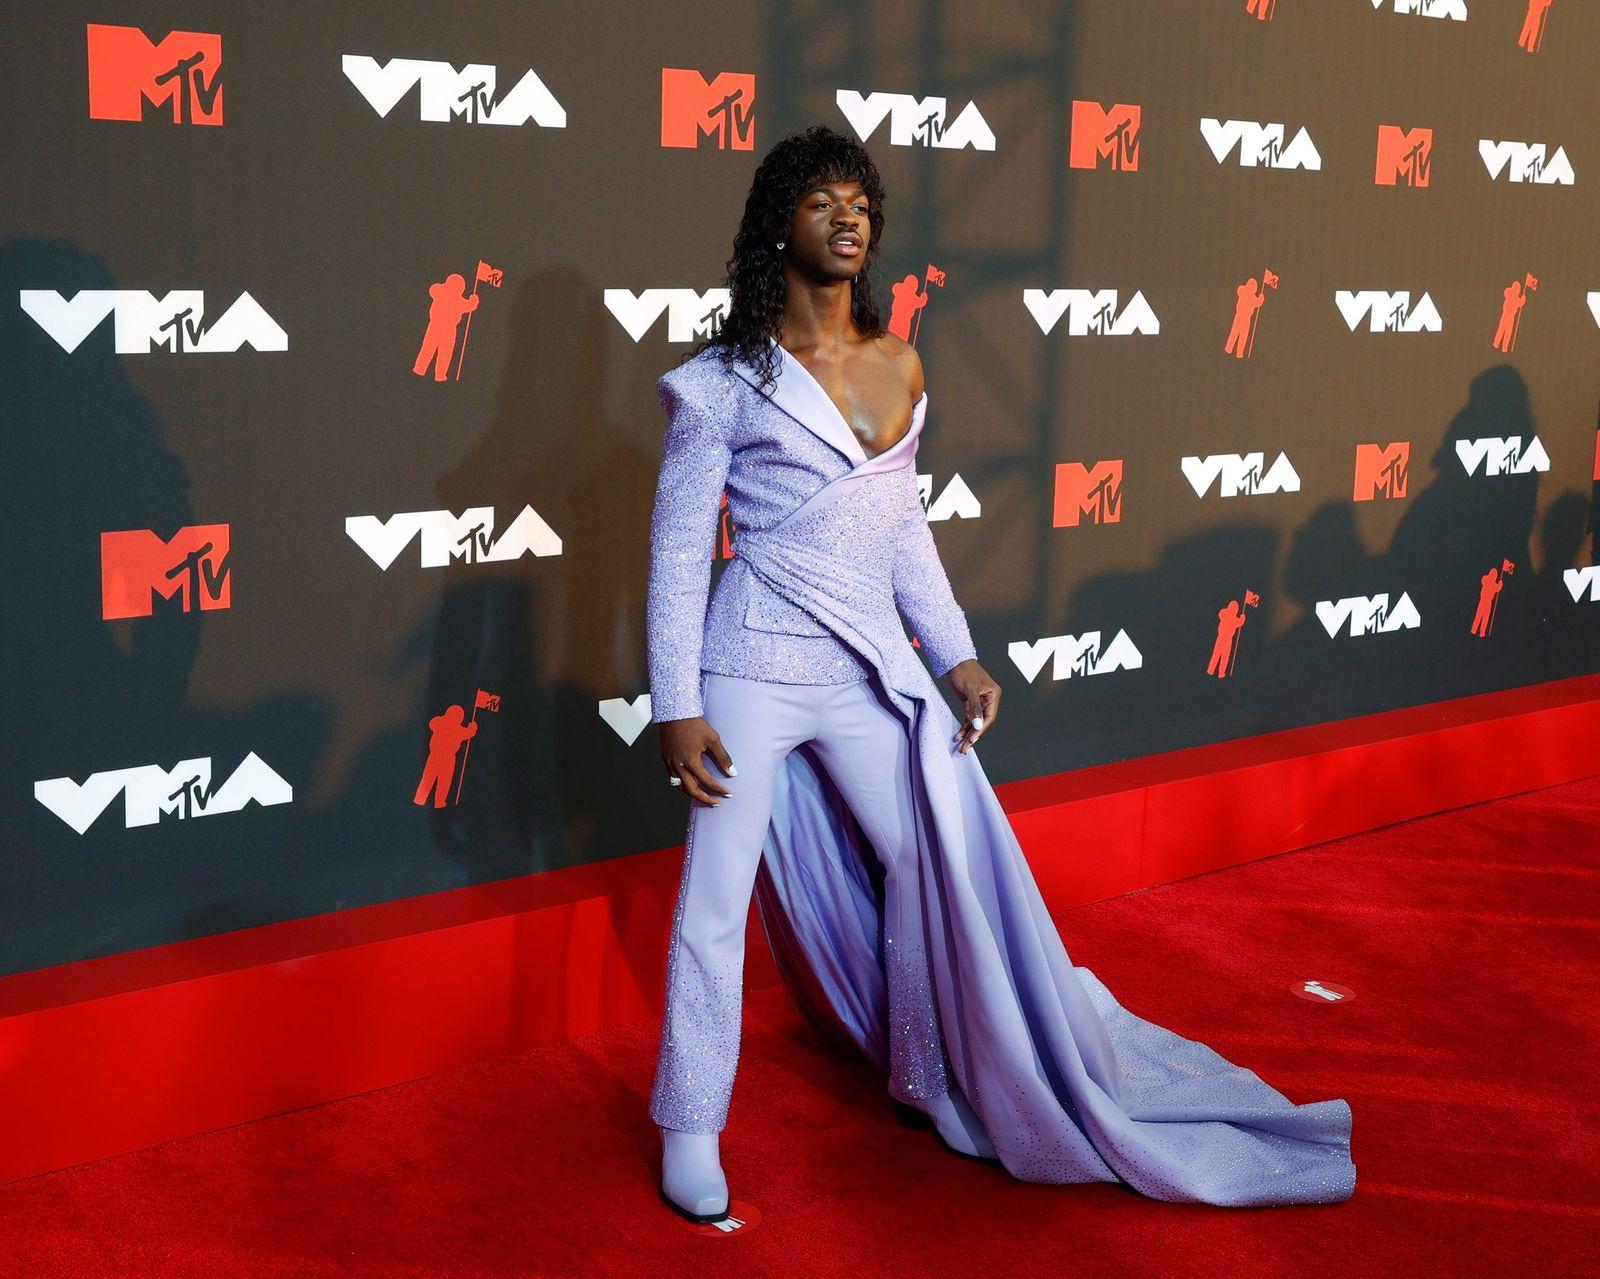 MTV Video Music Awards - Red Carpet Arrivals